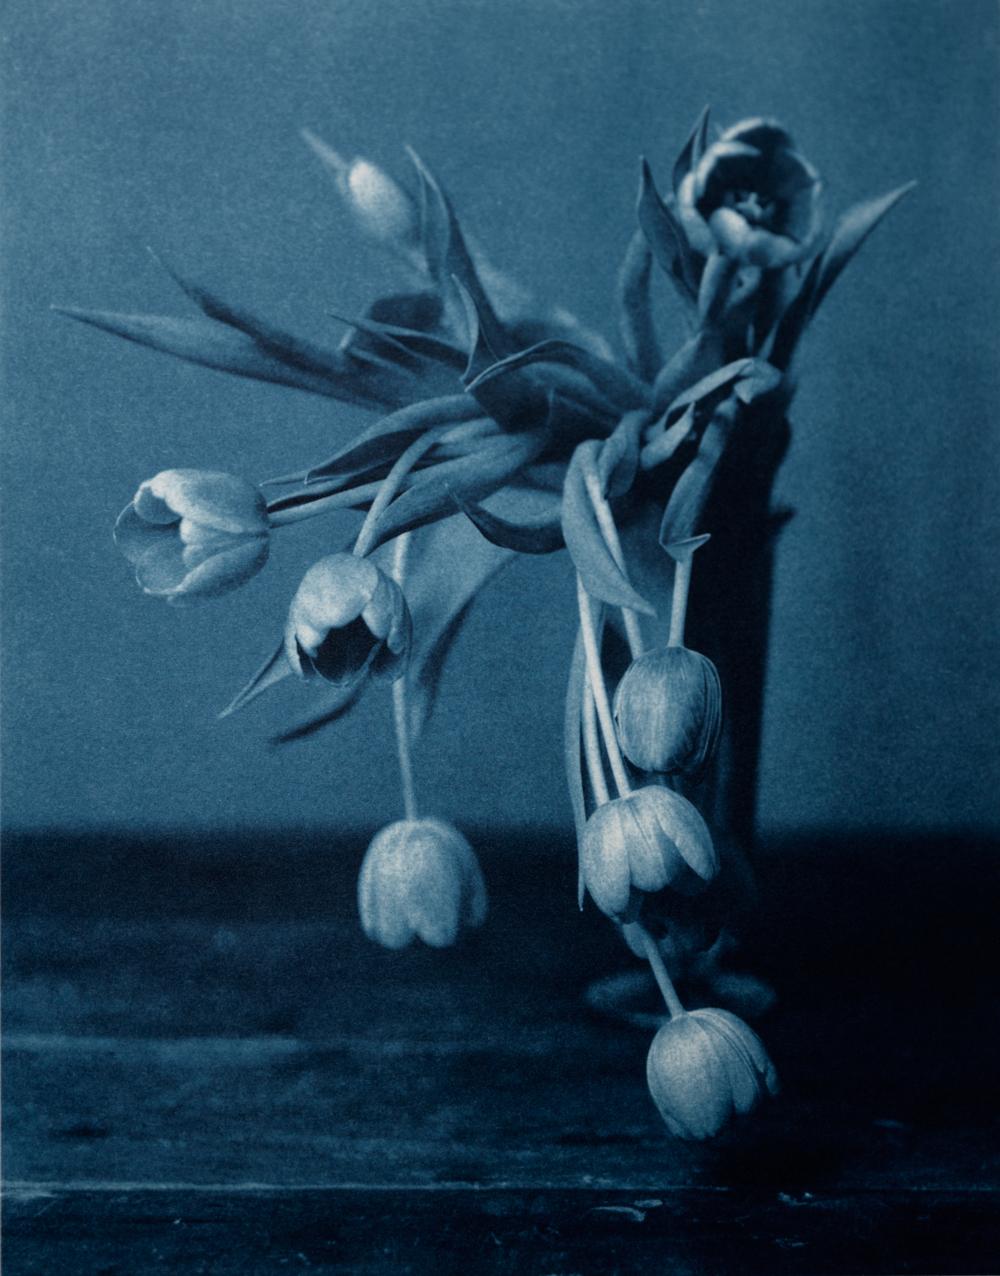 John Dugdale // Mourning Tulips // Morton Street, N.Y.C. // 1999 // Cyanotype Print